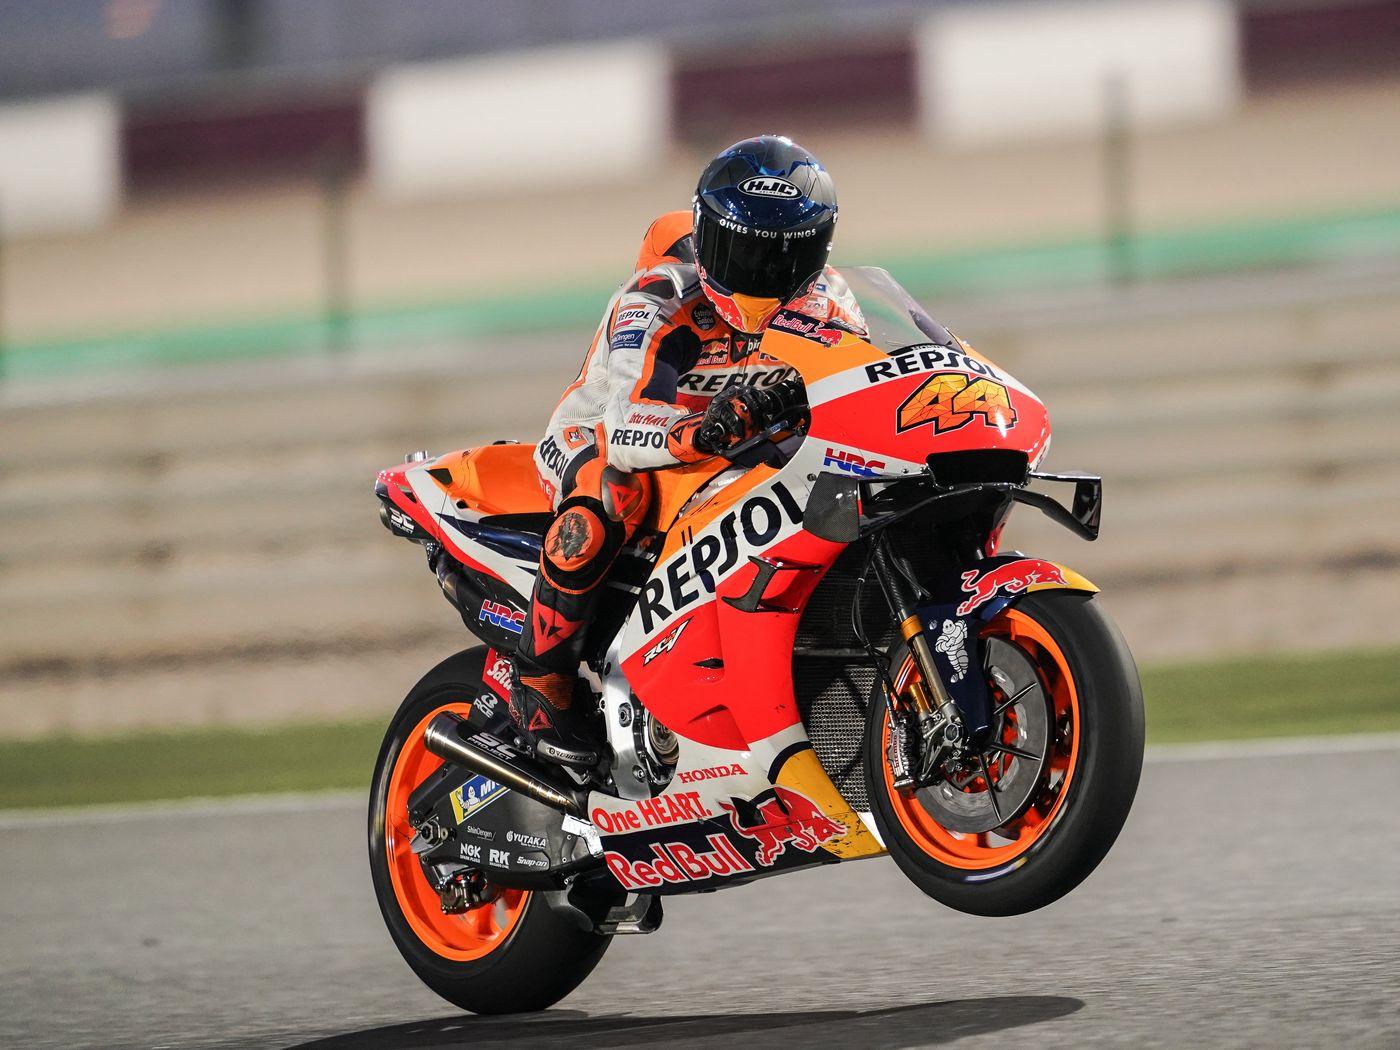 1400x1050 Wallpaper honda, motorcycle, motorcyclist, helmet, speed, track, orange